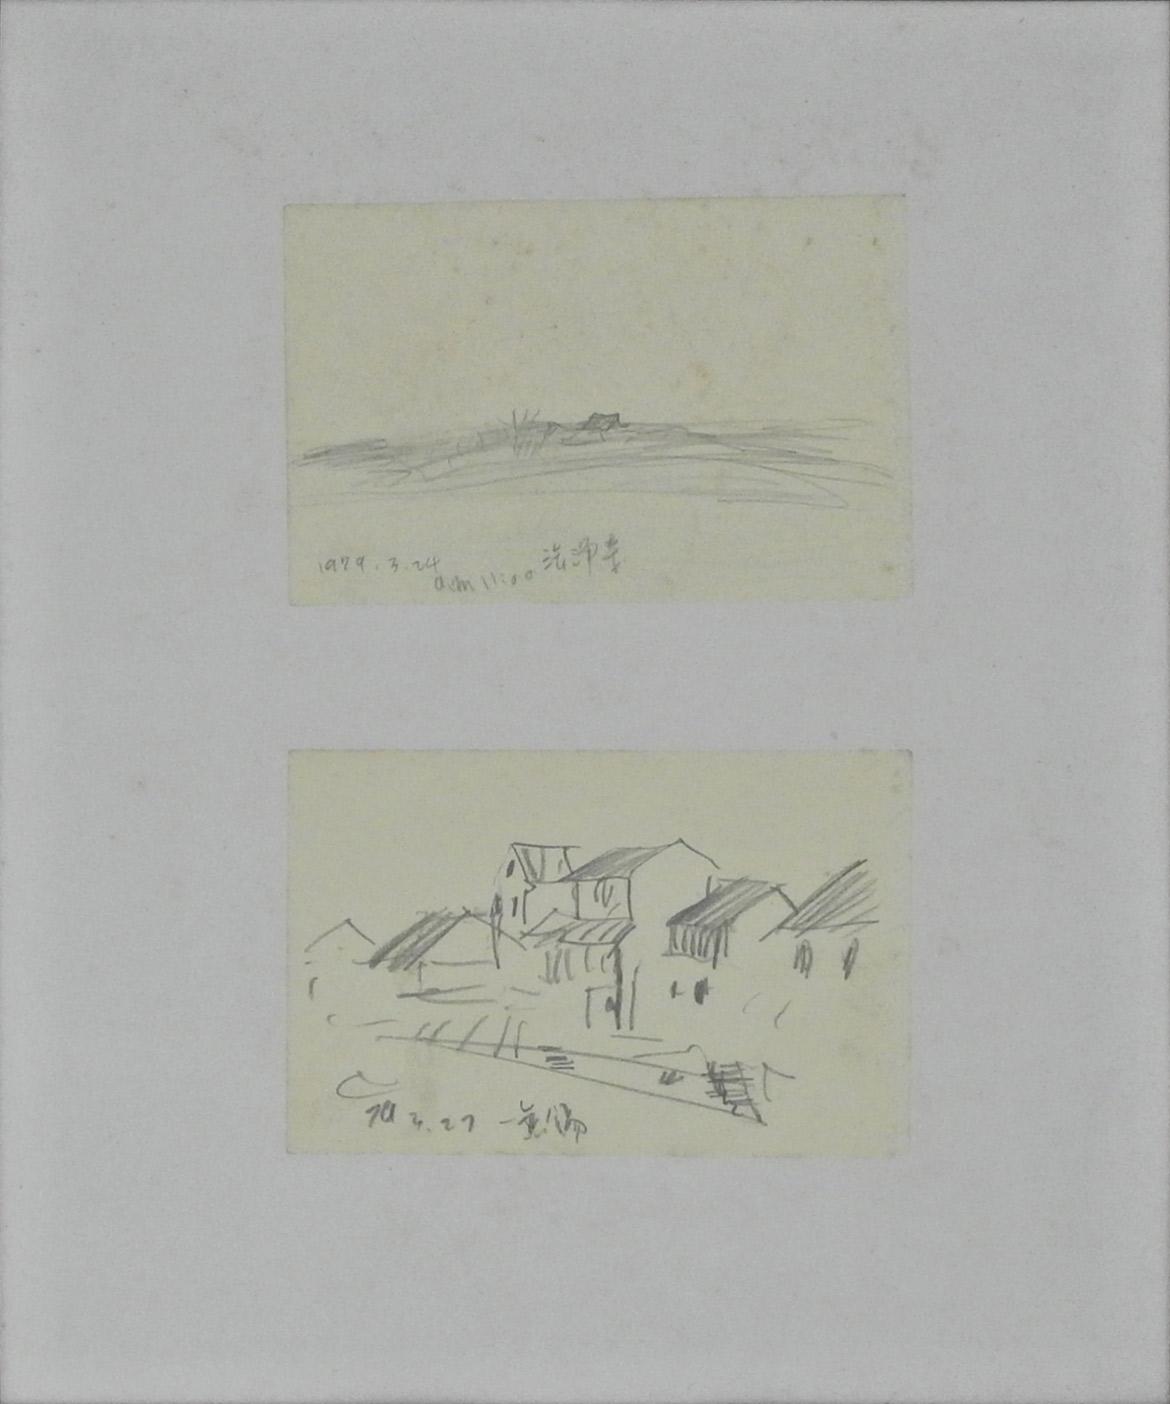 Sketch (Landscape) 2 sheets set (Hojoji Temple (Hangzhou))